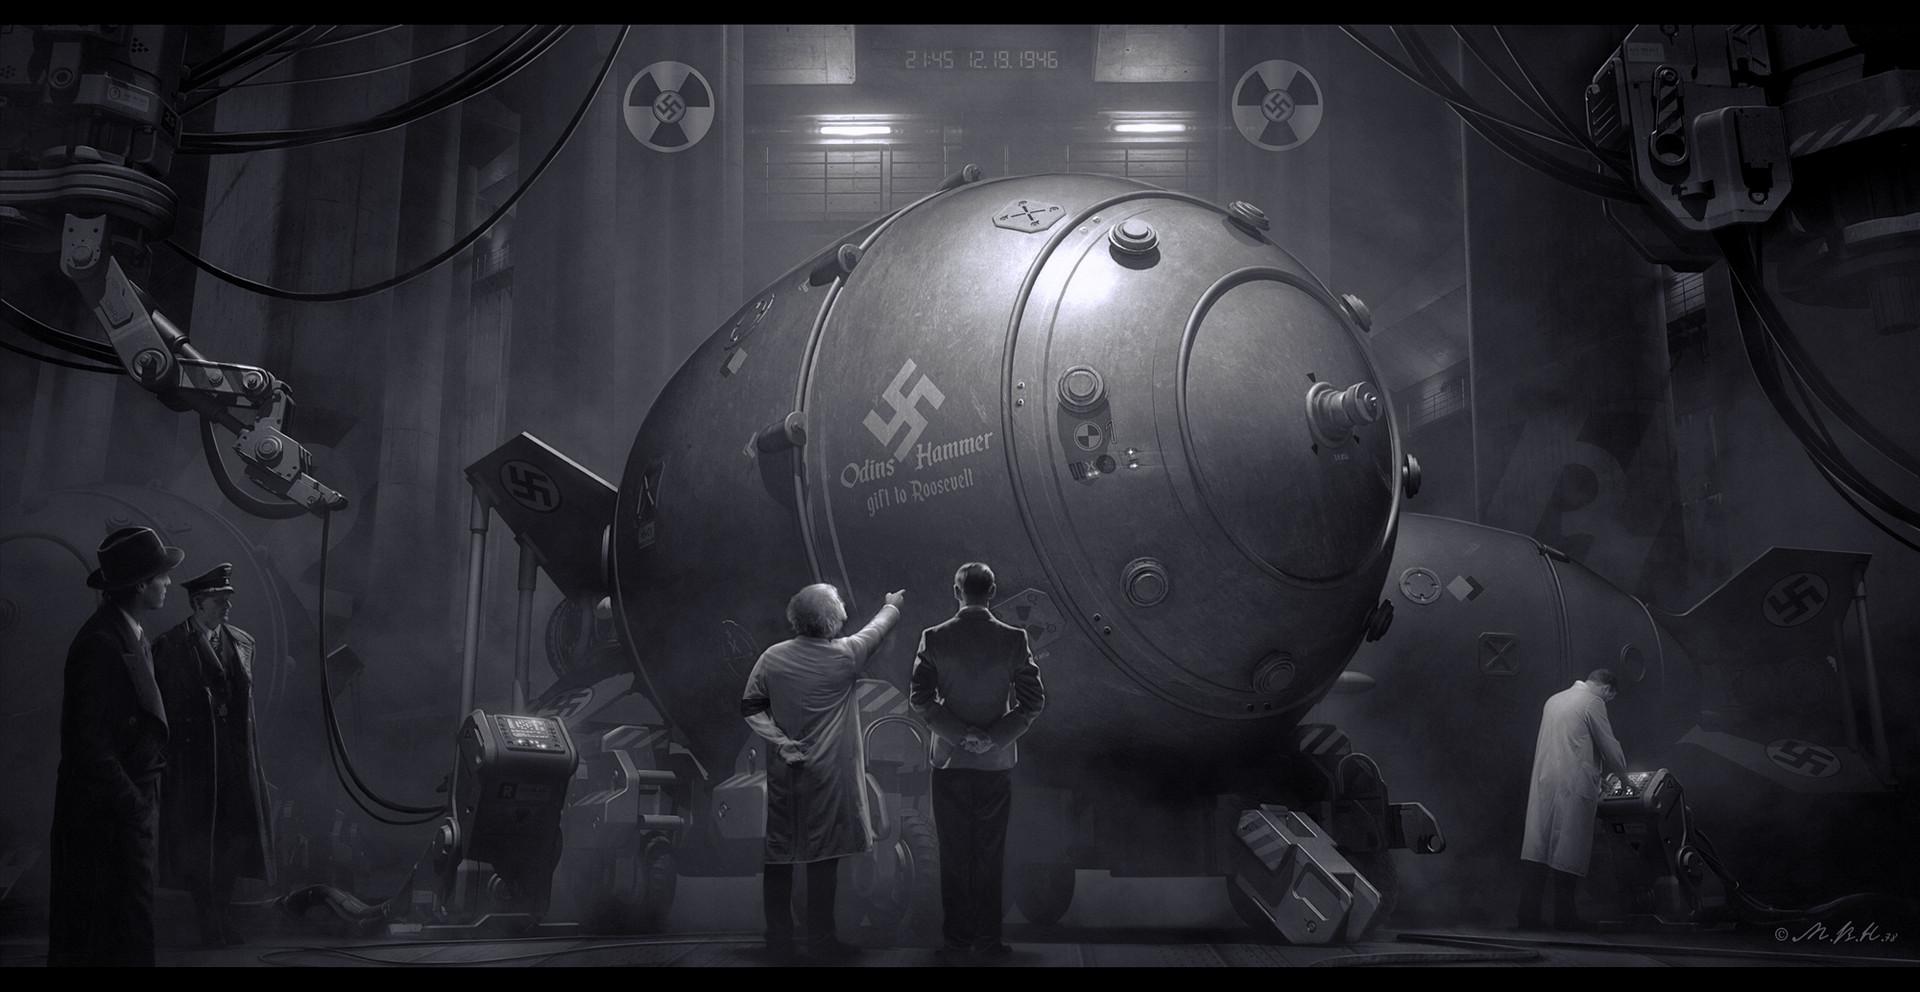 Vladimir manyukhin wolfenstein 2 the new colossus4